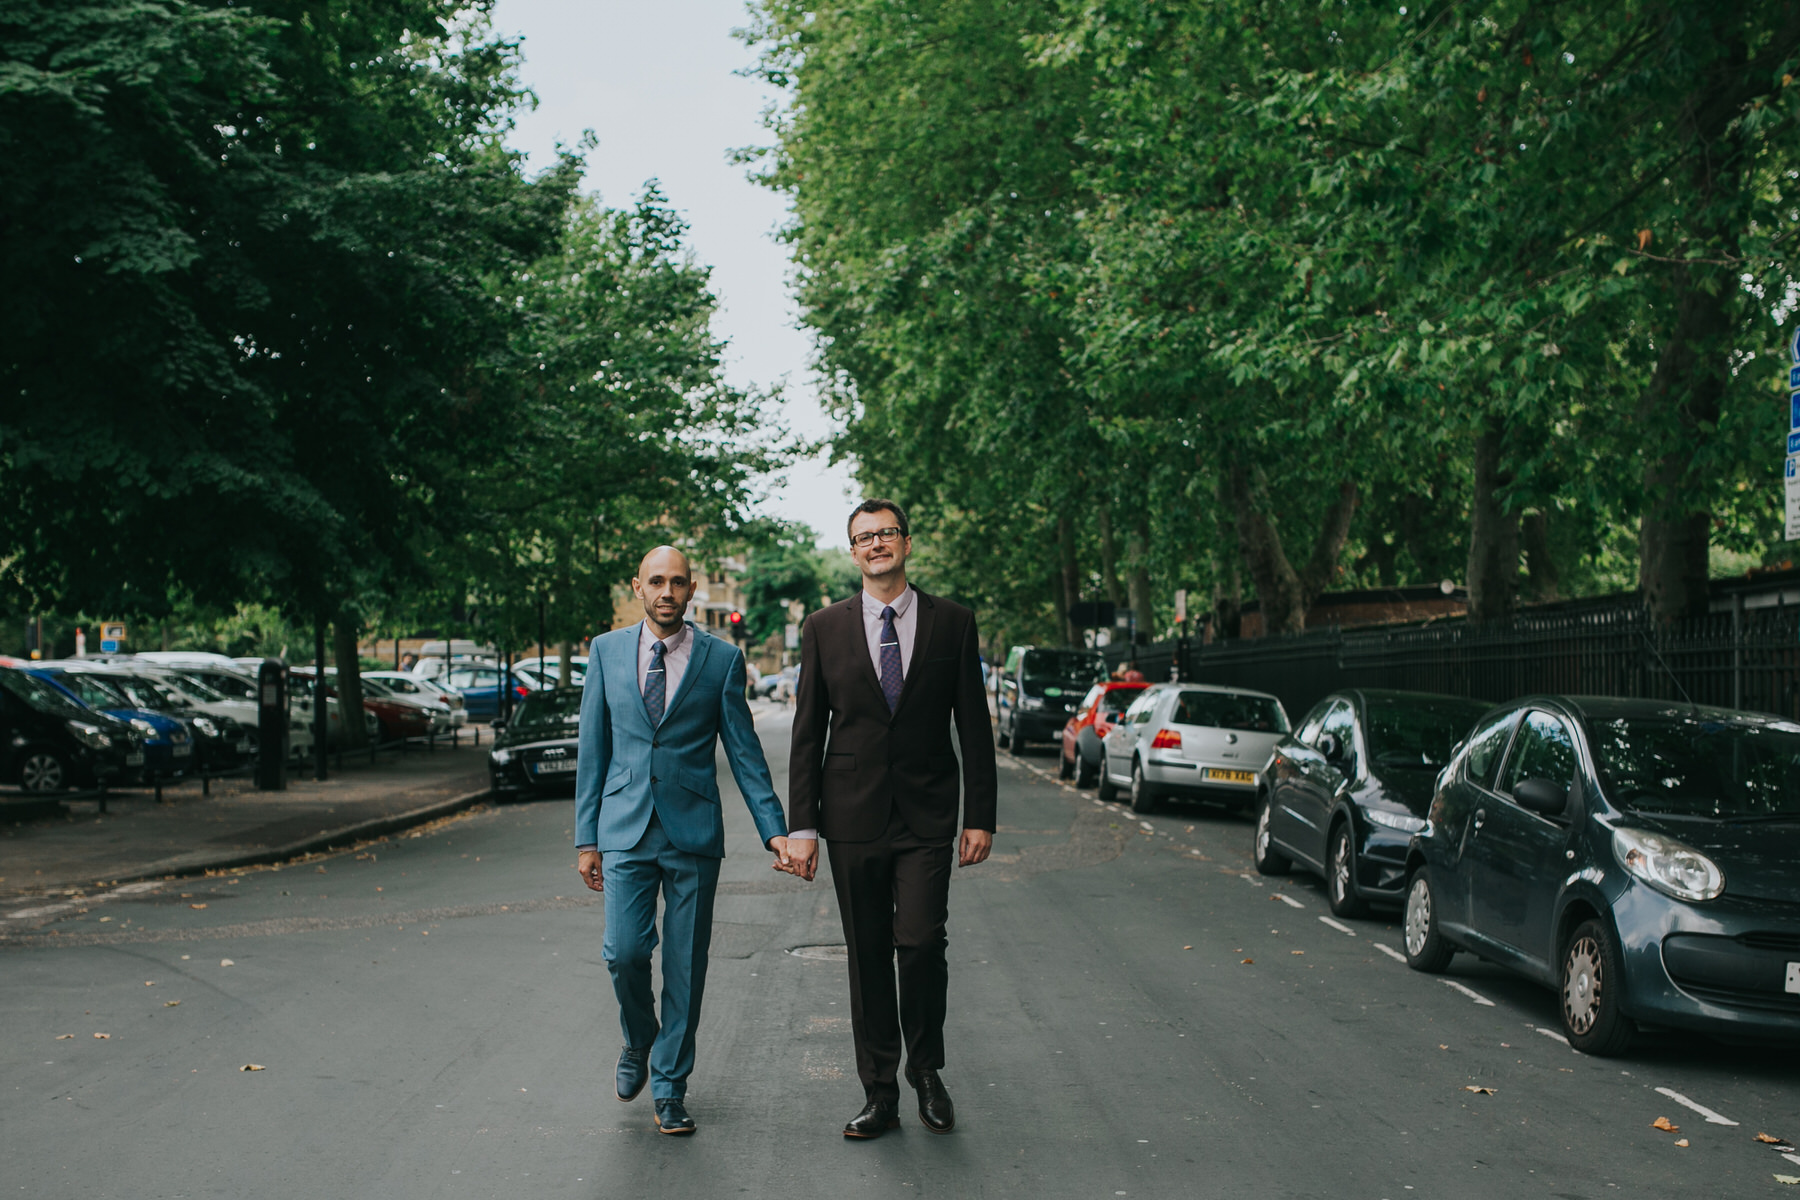 two grooms walking holding hands London road wedding ceremony.jpg